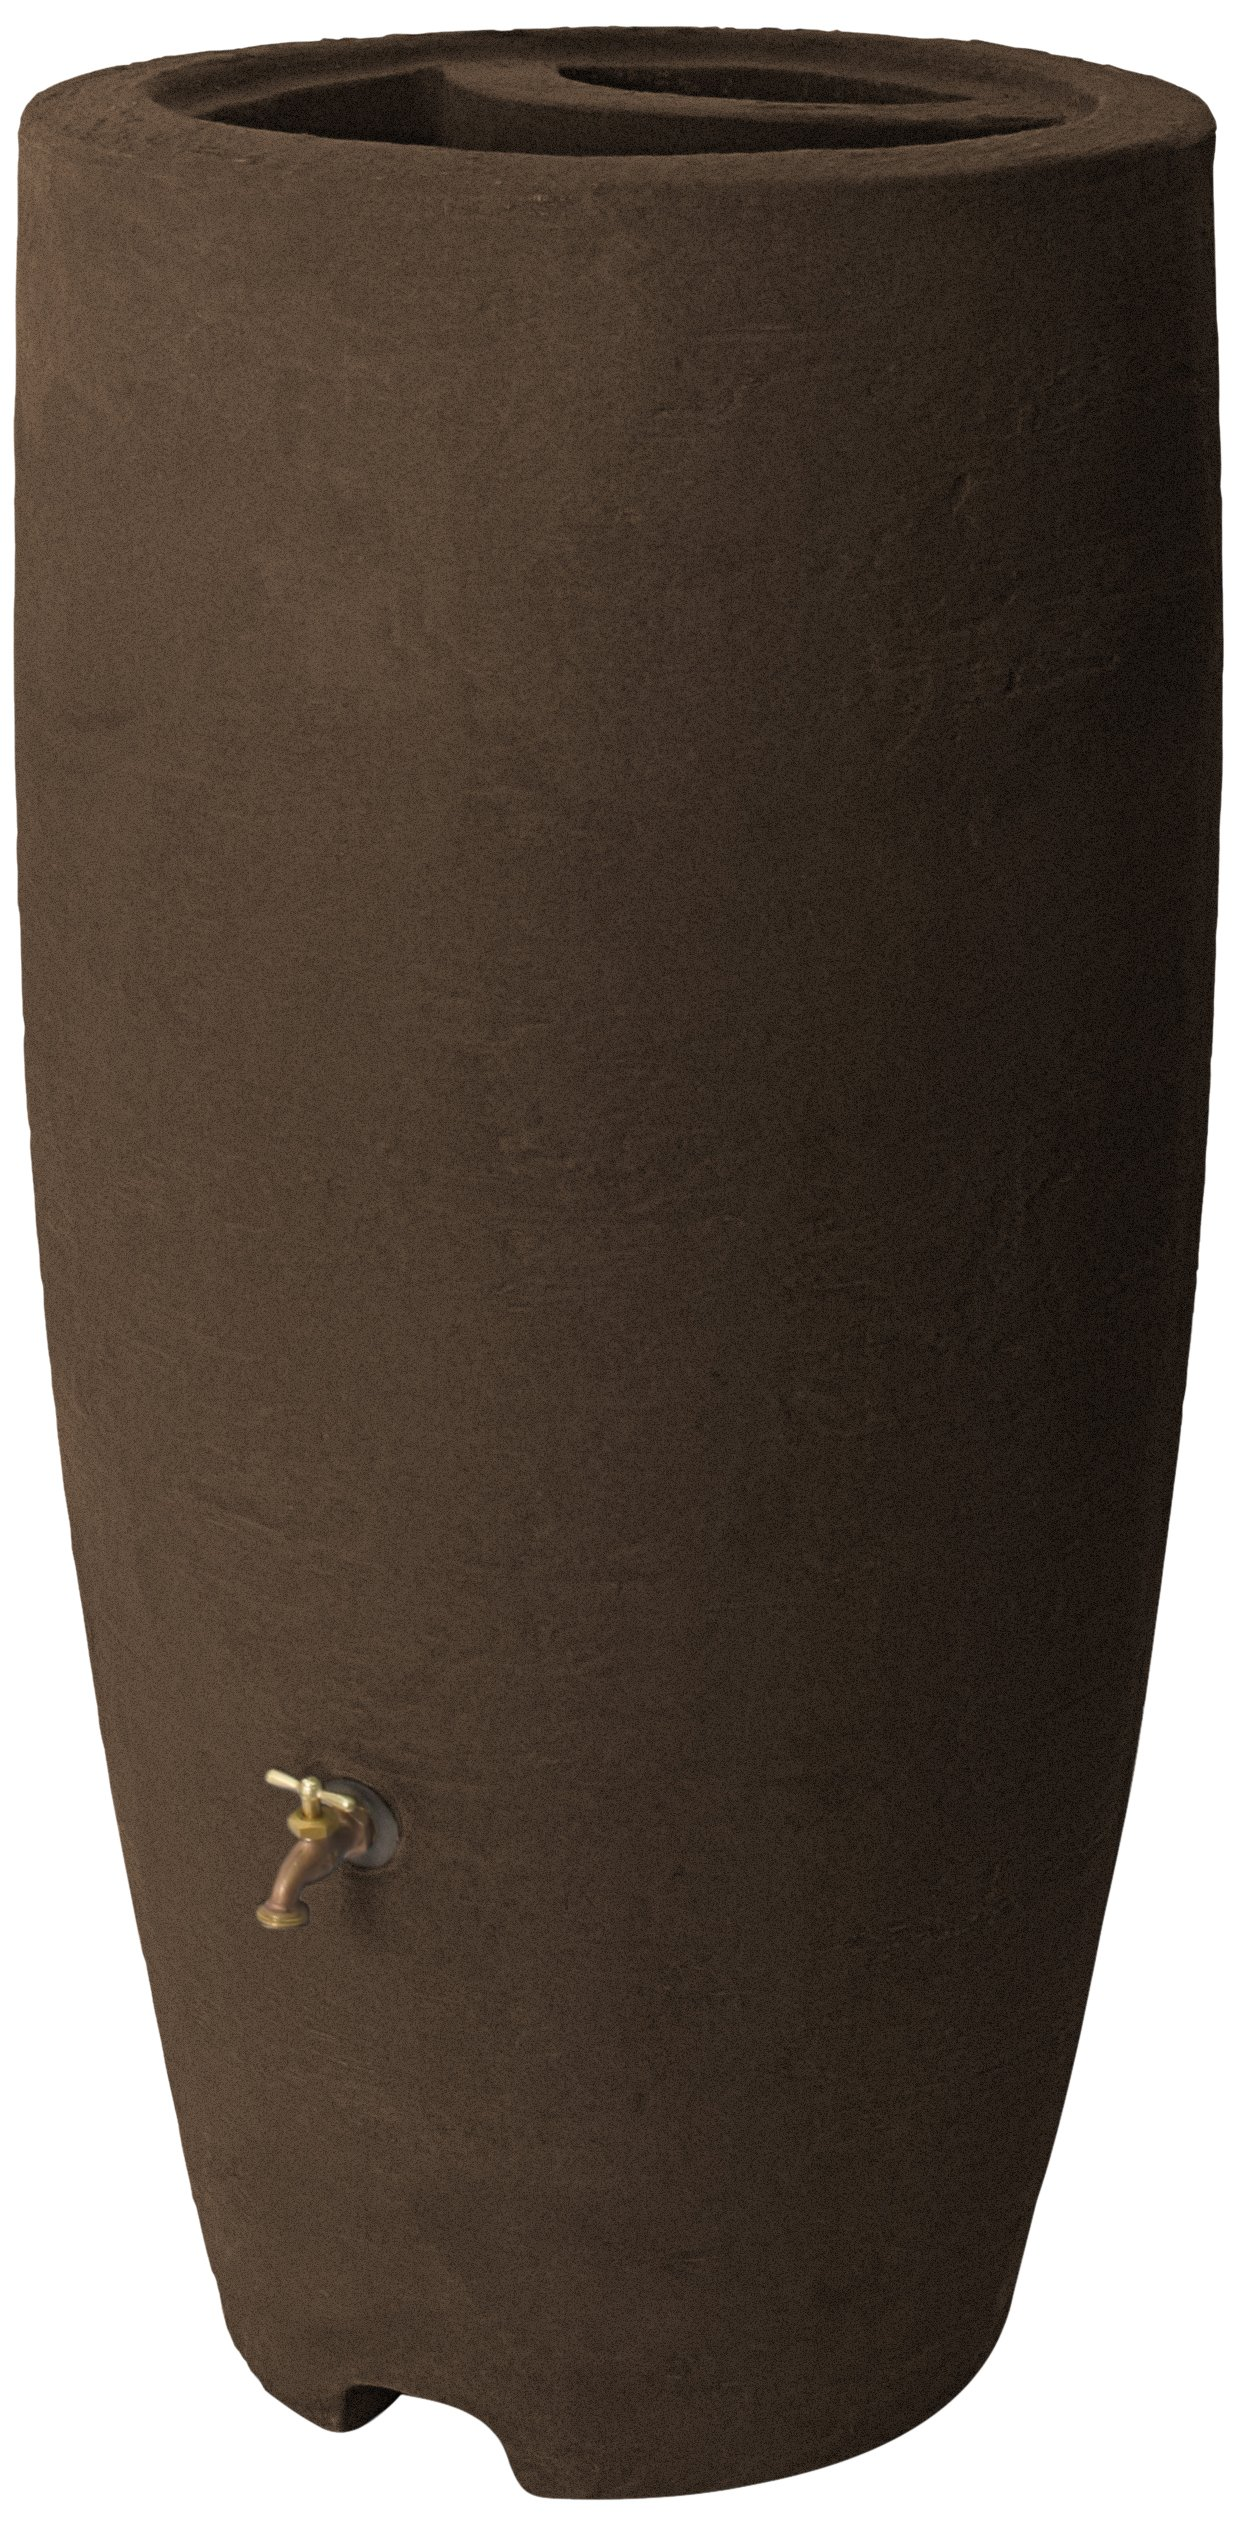 Algreen Products Athena Rain Barrel 80-Gallon, Brownstone